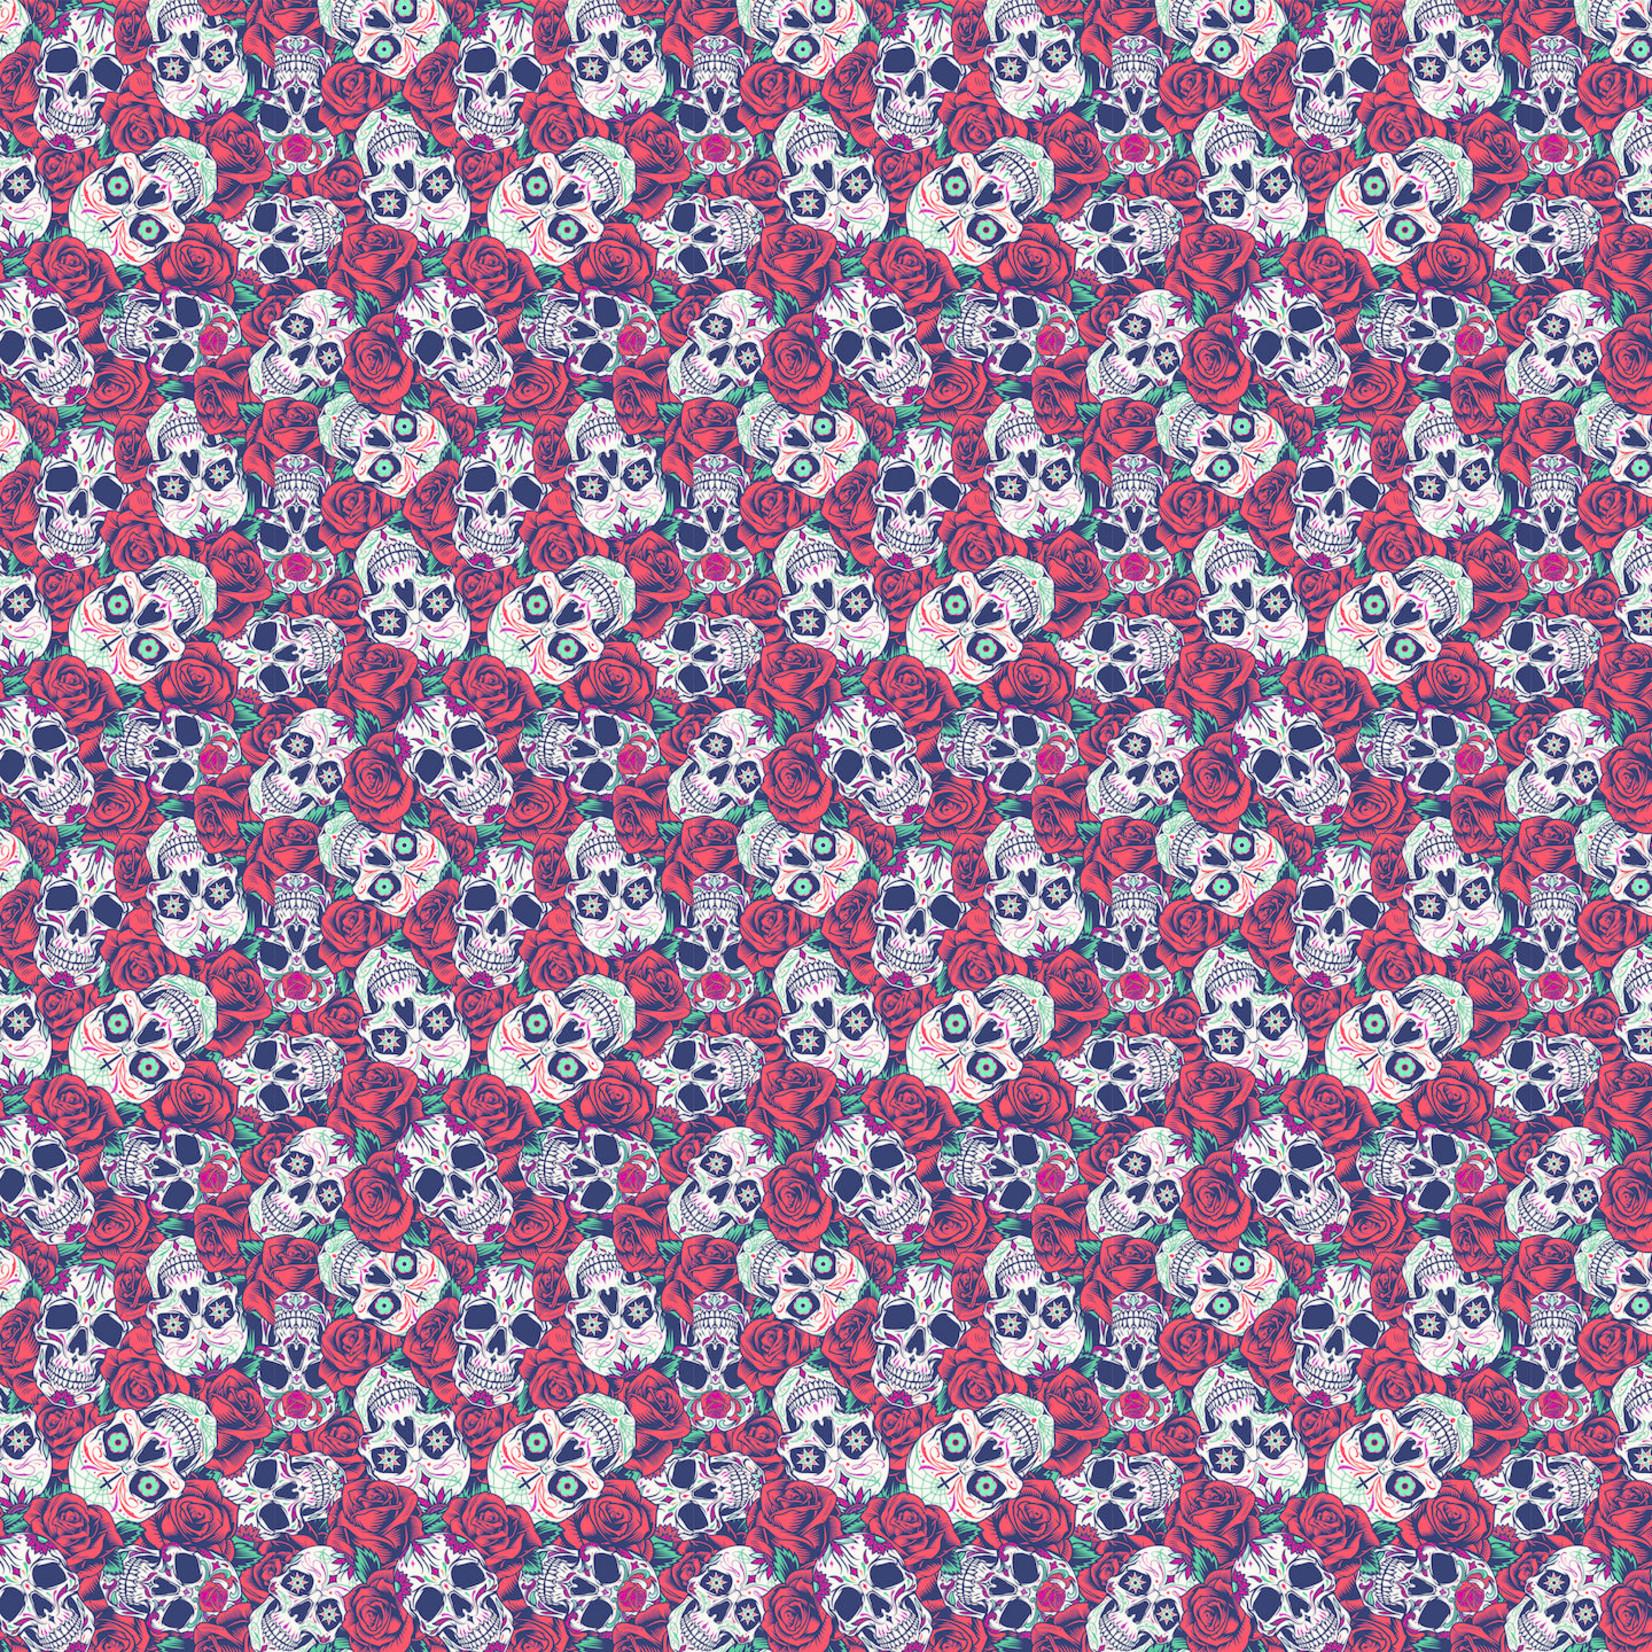 TVD Sugar Skulls With Roses